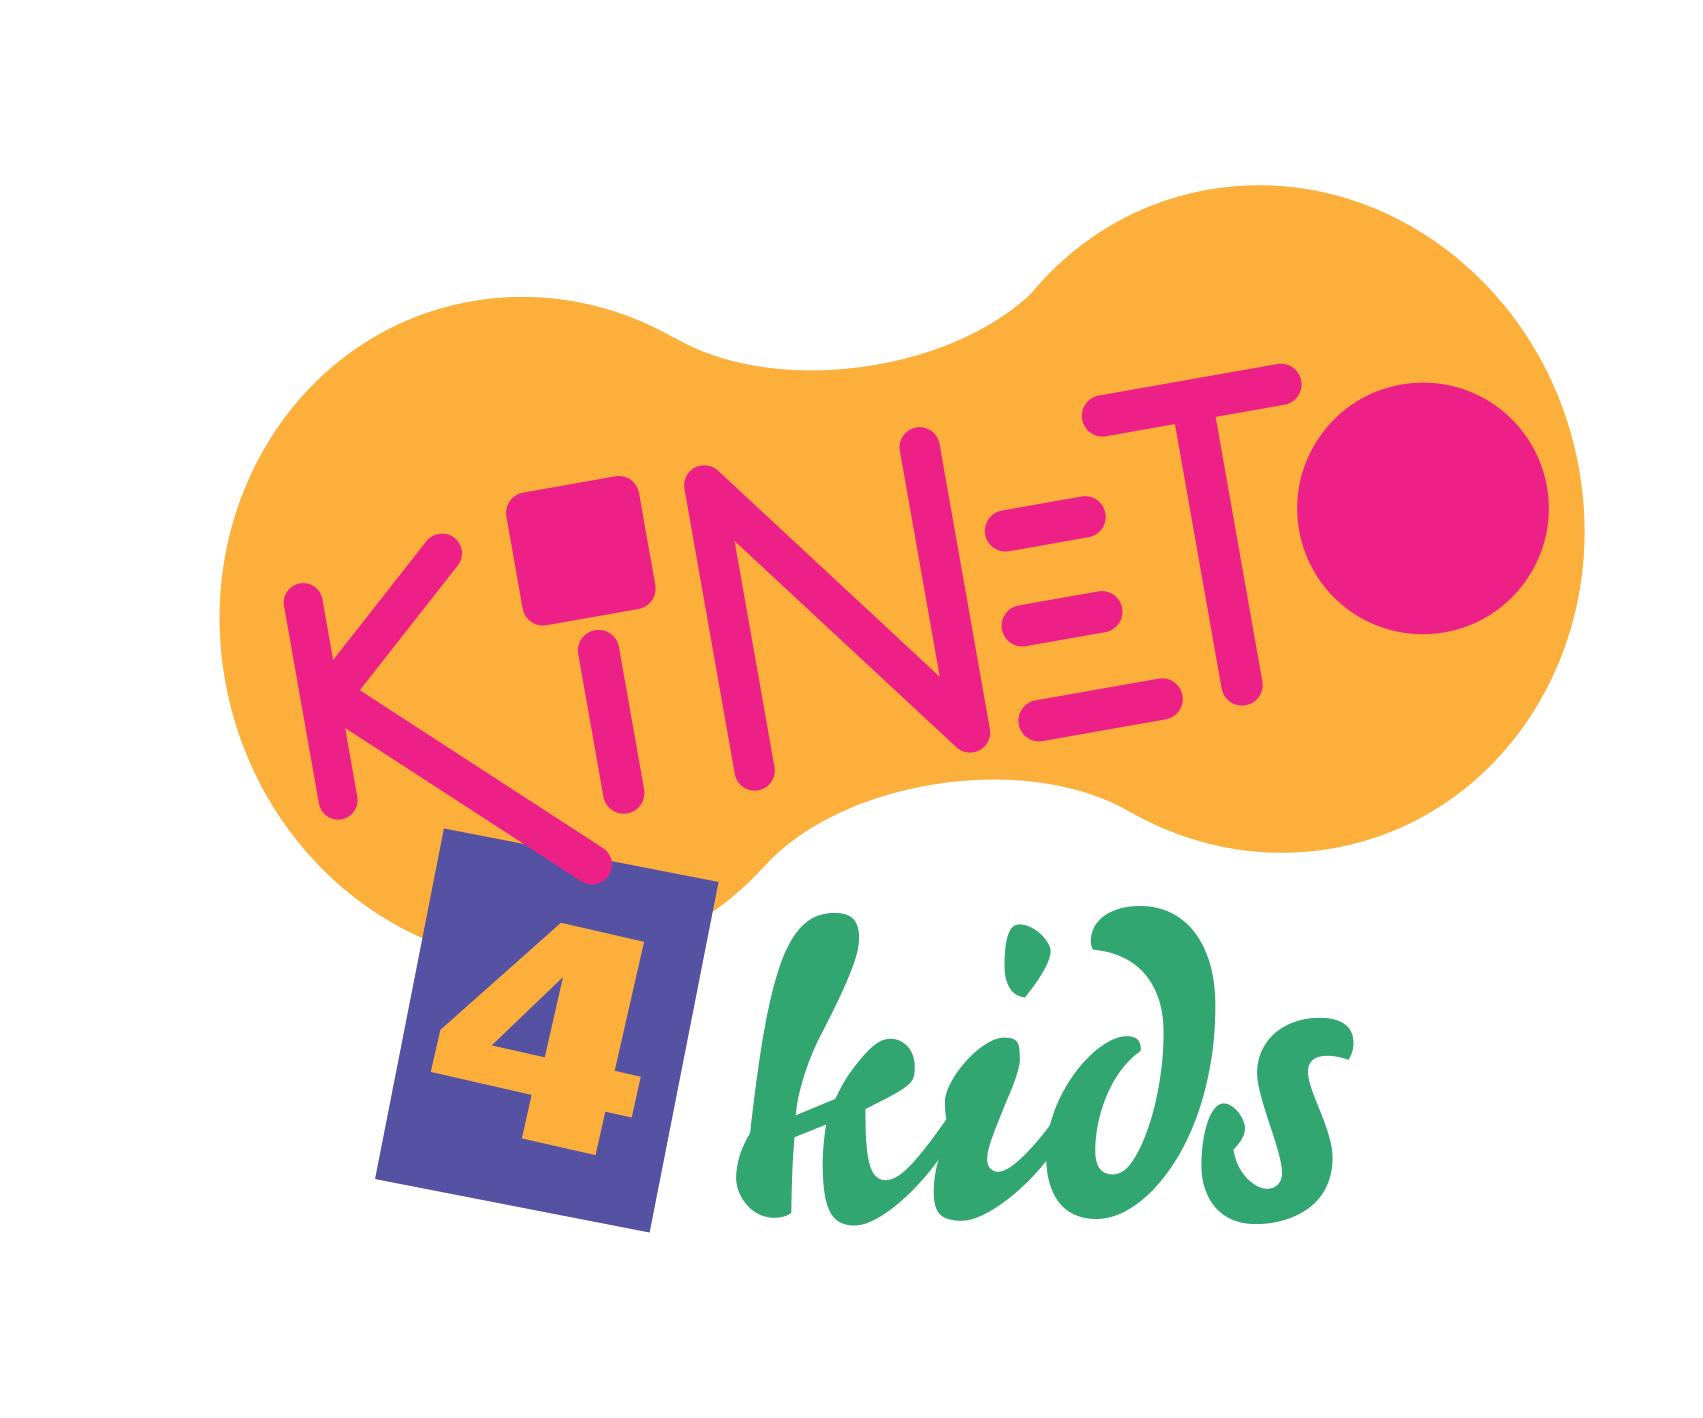 http://kineto4kids.ro/